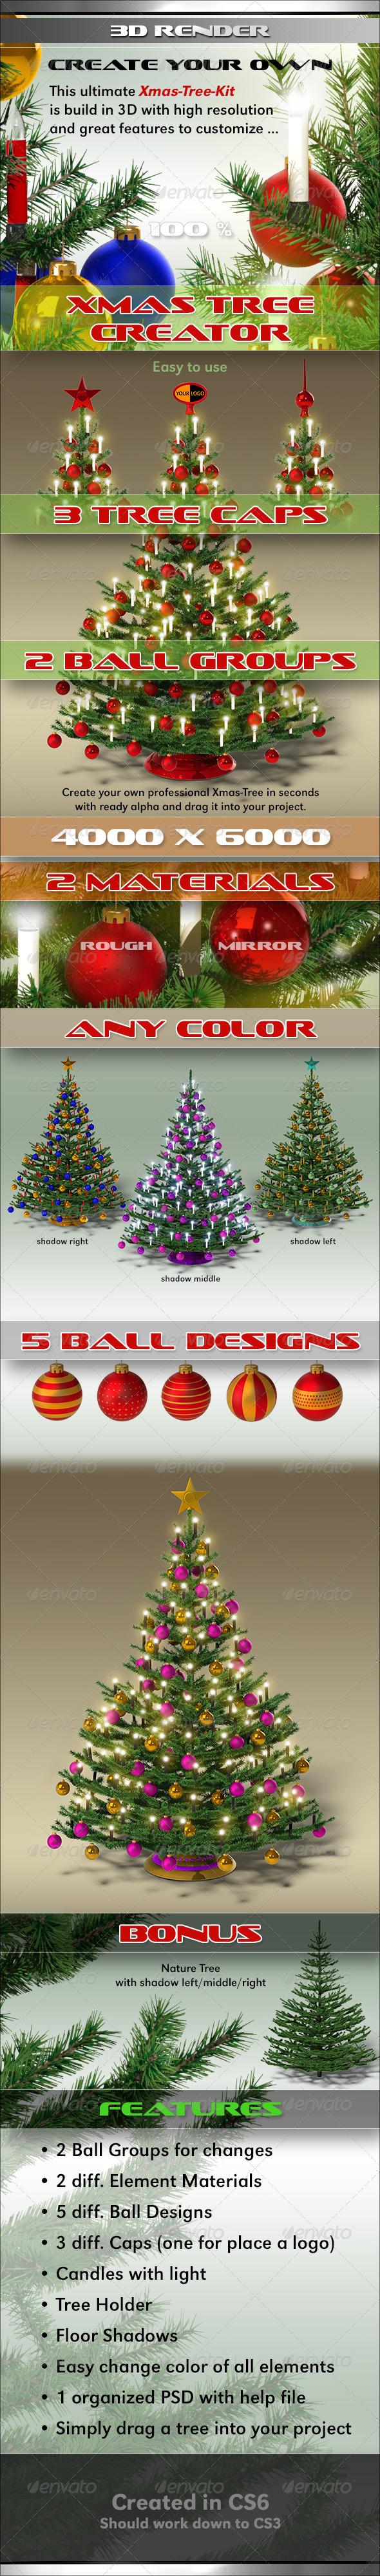 GraphicRiver Xmas Tree Creator 3434019